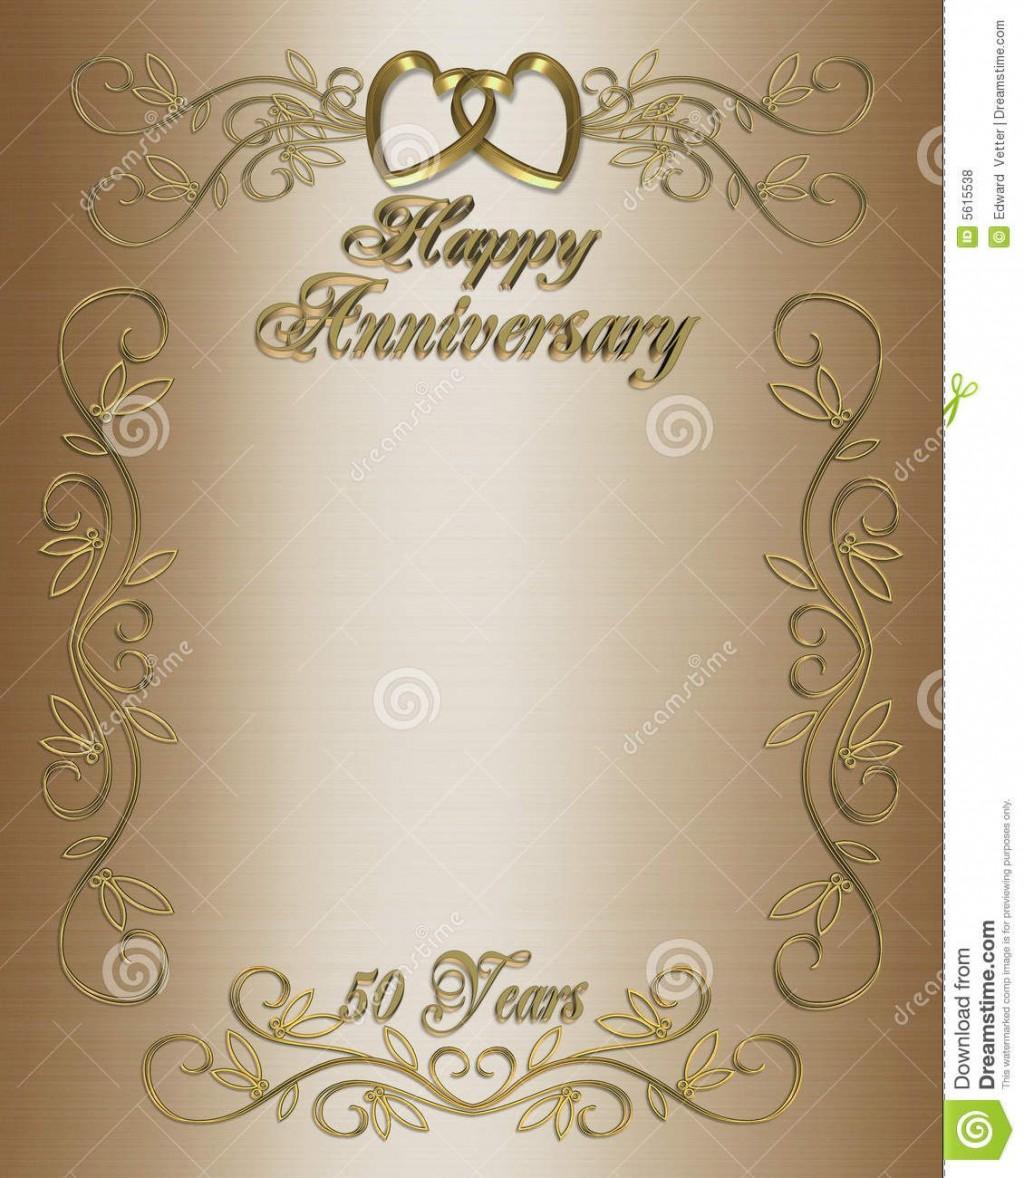 001 Wondrou 50th Anniversary Invitation Design High Def  Designs Wedding Template Microsoft Word Surprise Party Wording Card IdeaLarge